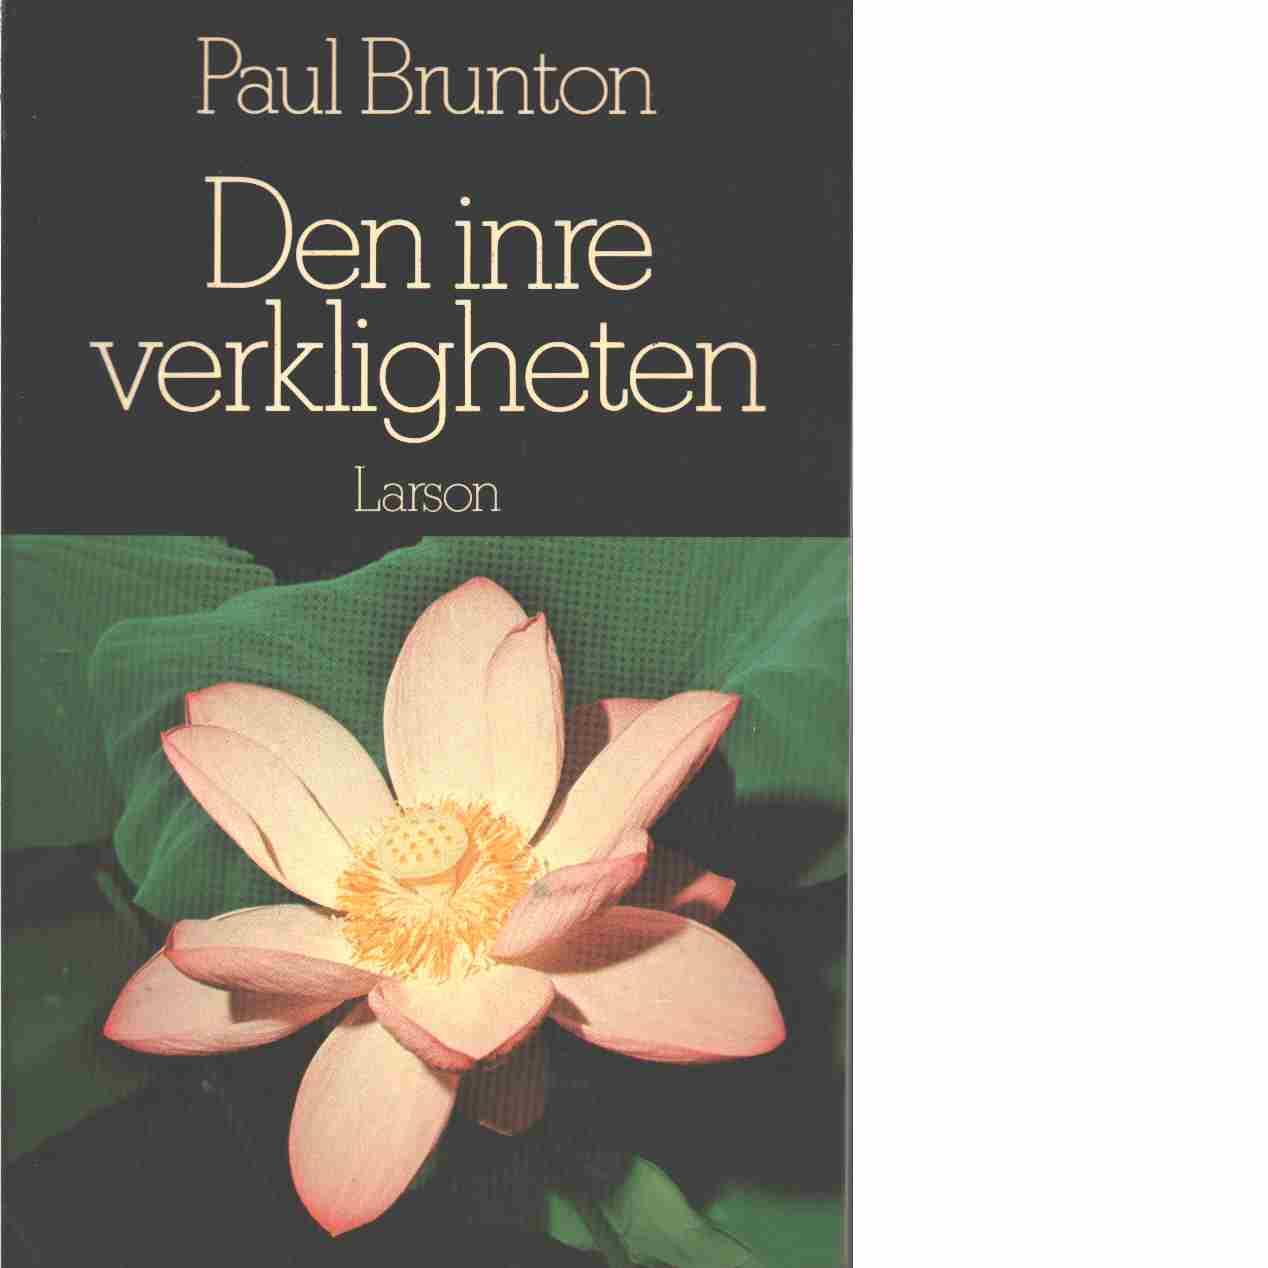 Den inre verkligheten - Brunton, Paul